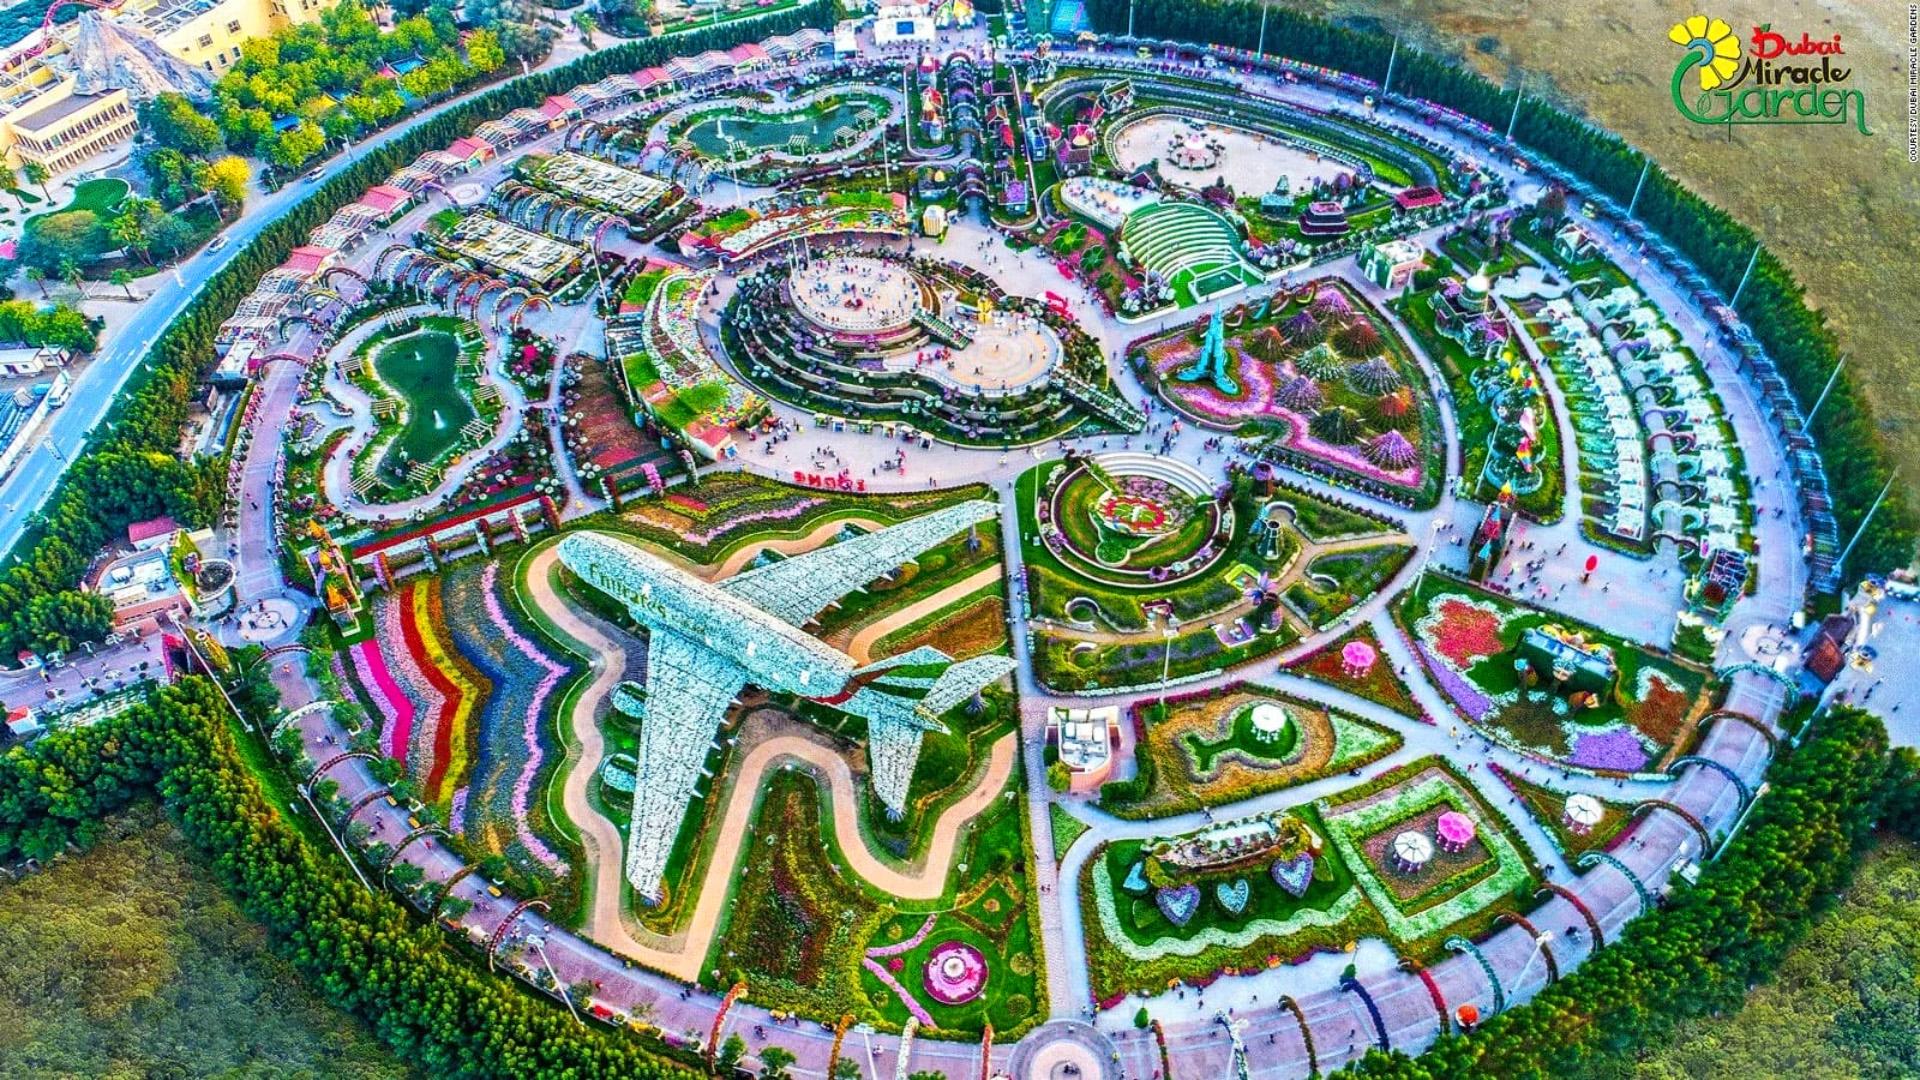 Парк цветов Сад чудес в Дубае карта